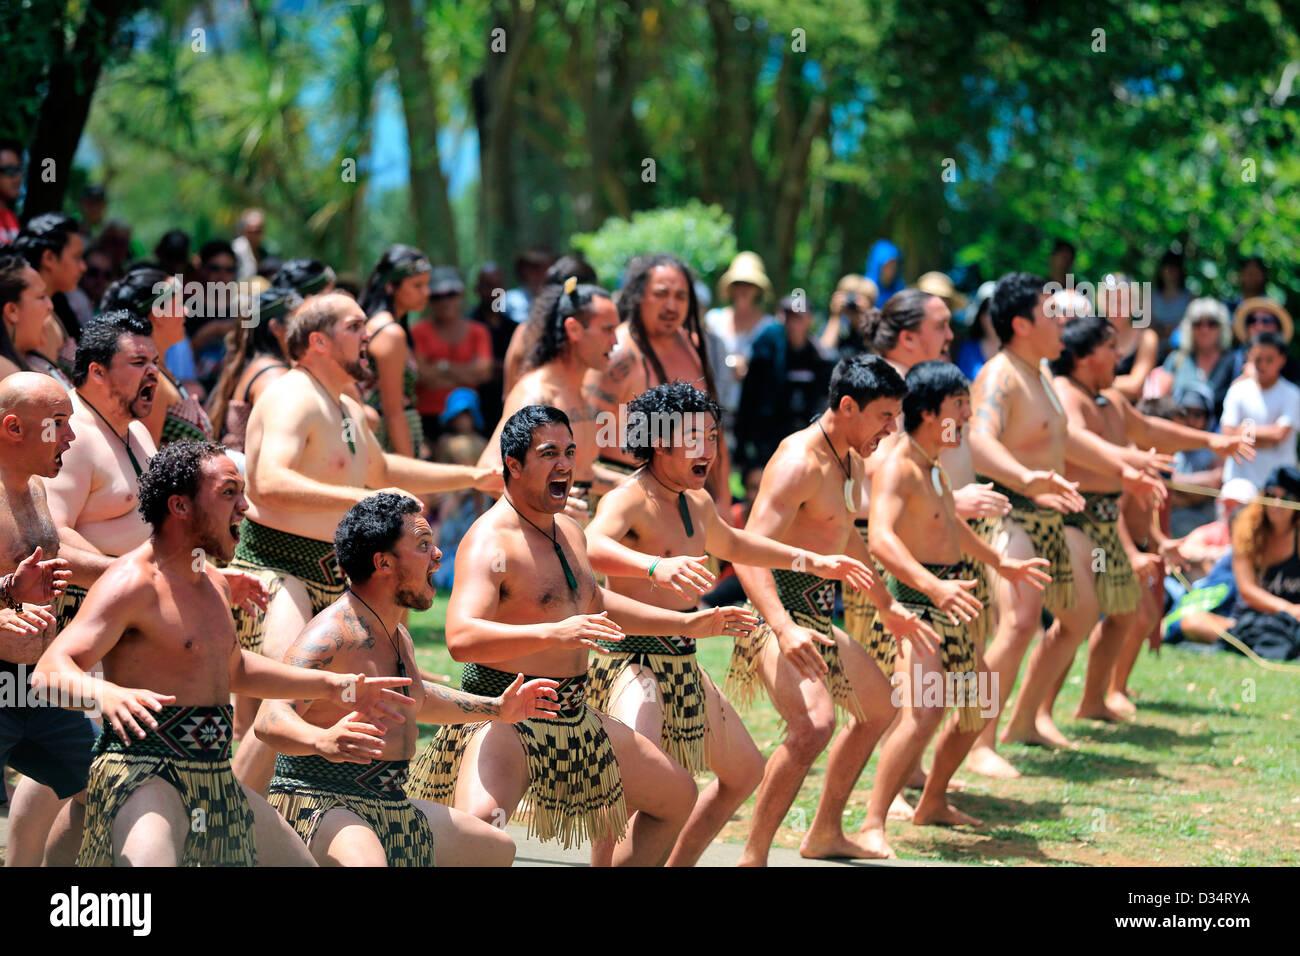 Kapa Haka group performs a Maori haka dance at the Waitangi Treaty Grounds during Waitangi Day celebrations Stock Photo